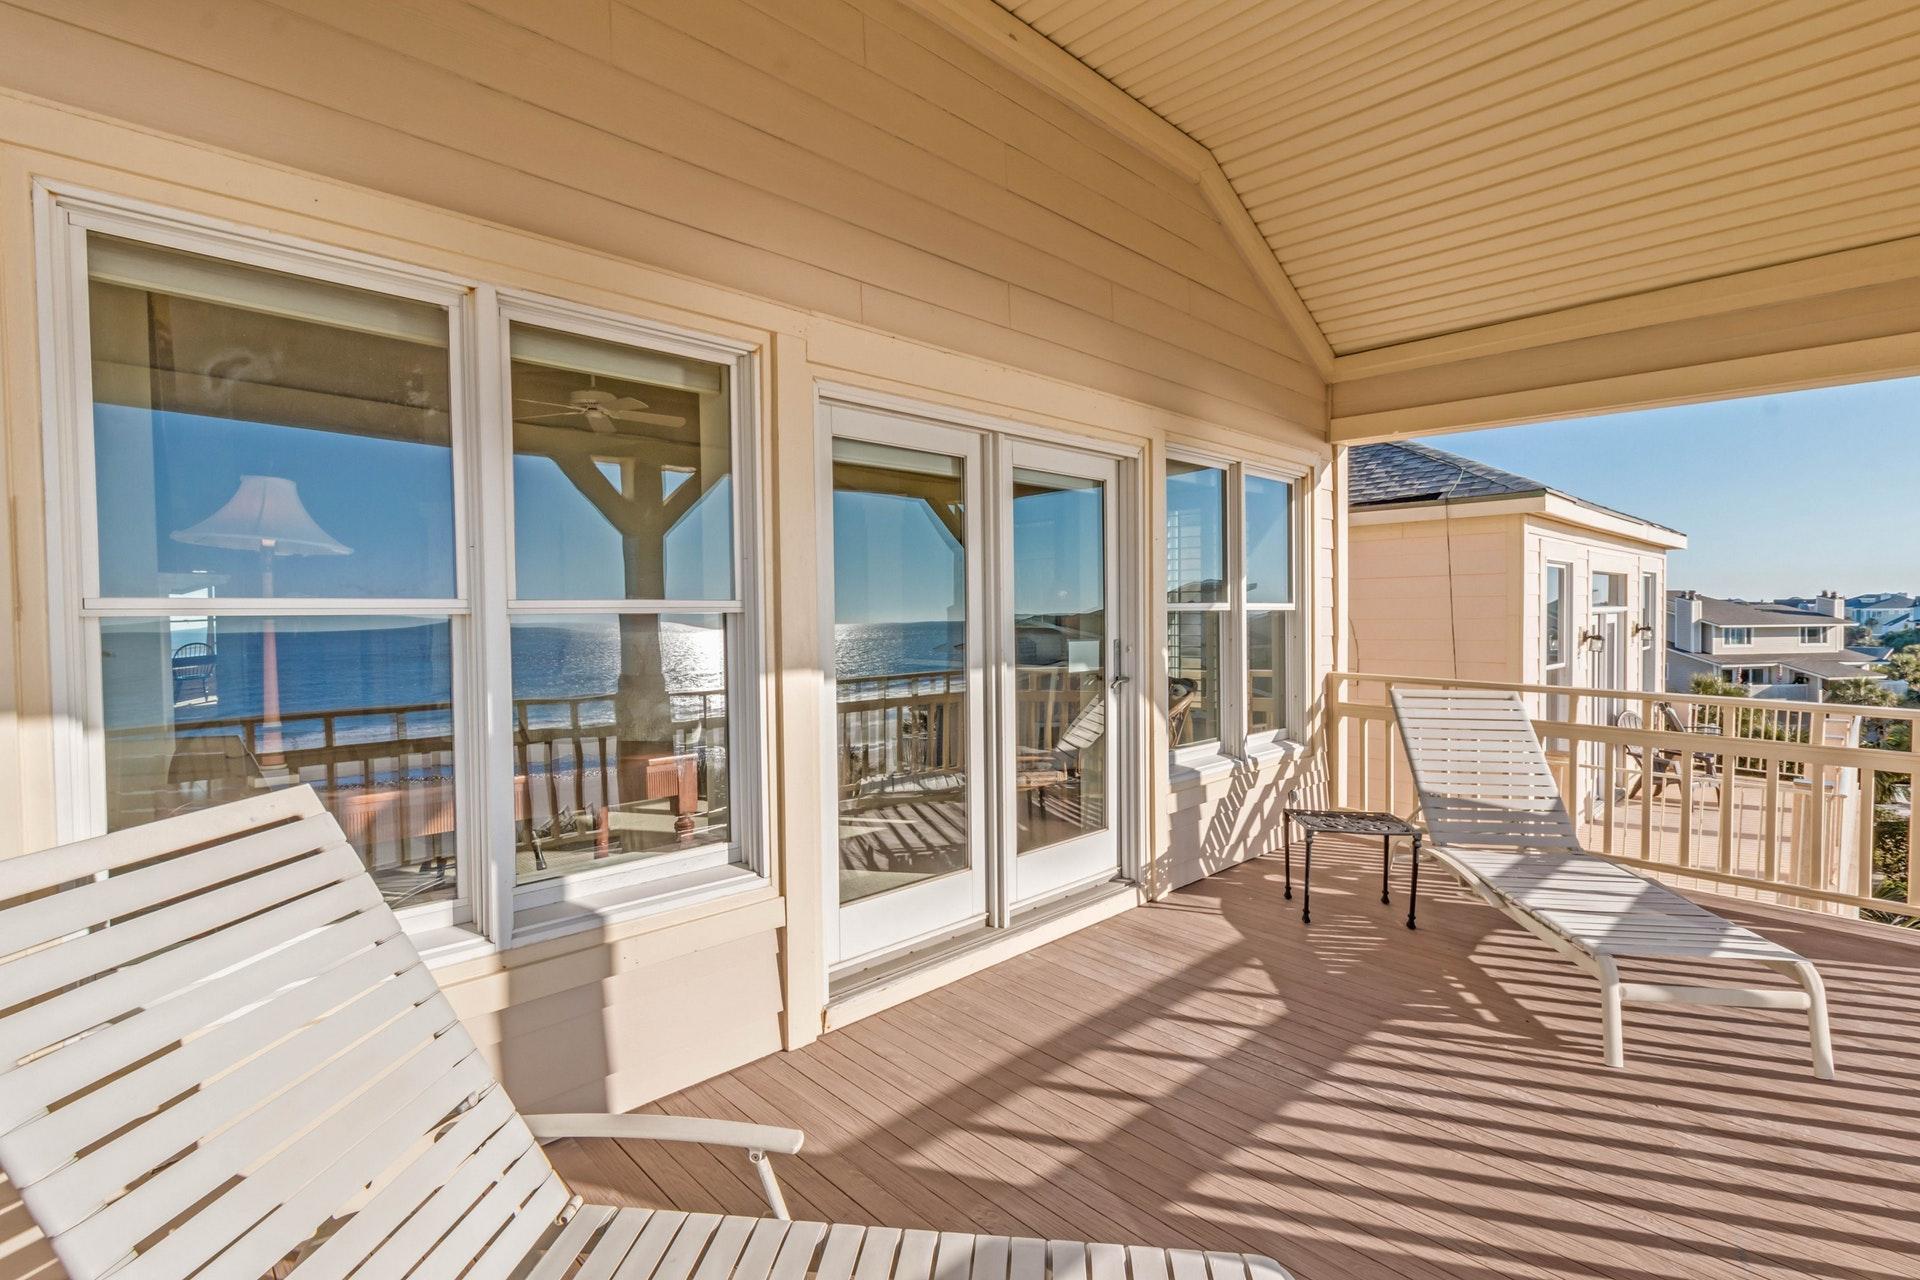 Photo of 63 Grand Pavilion Blvd, Isle of Palms, SC 29451